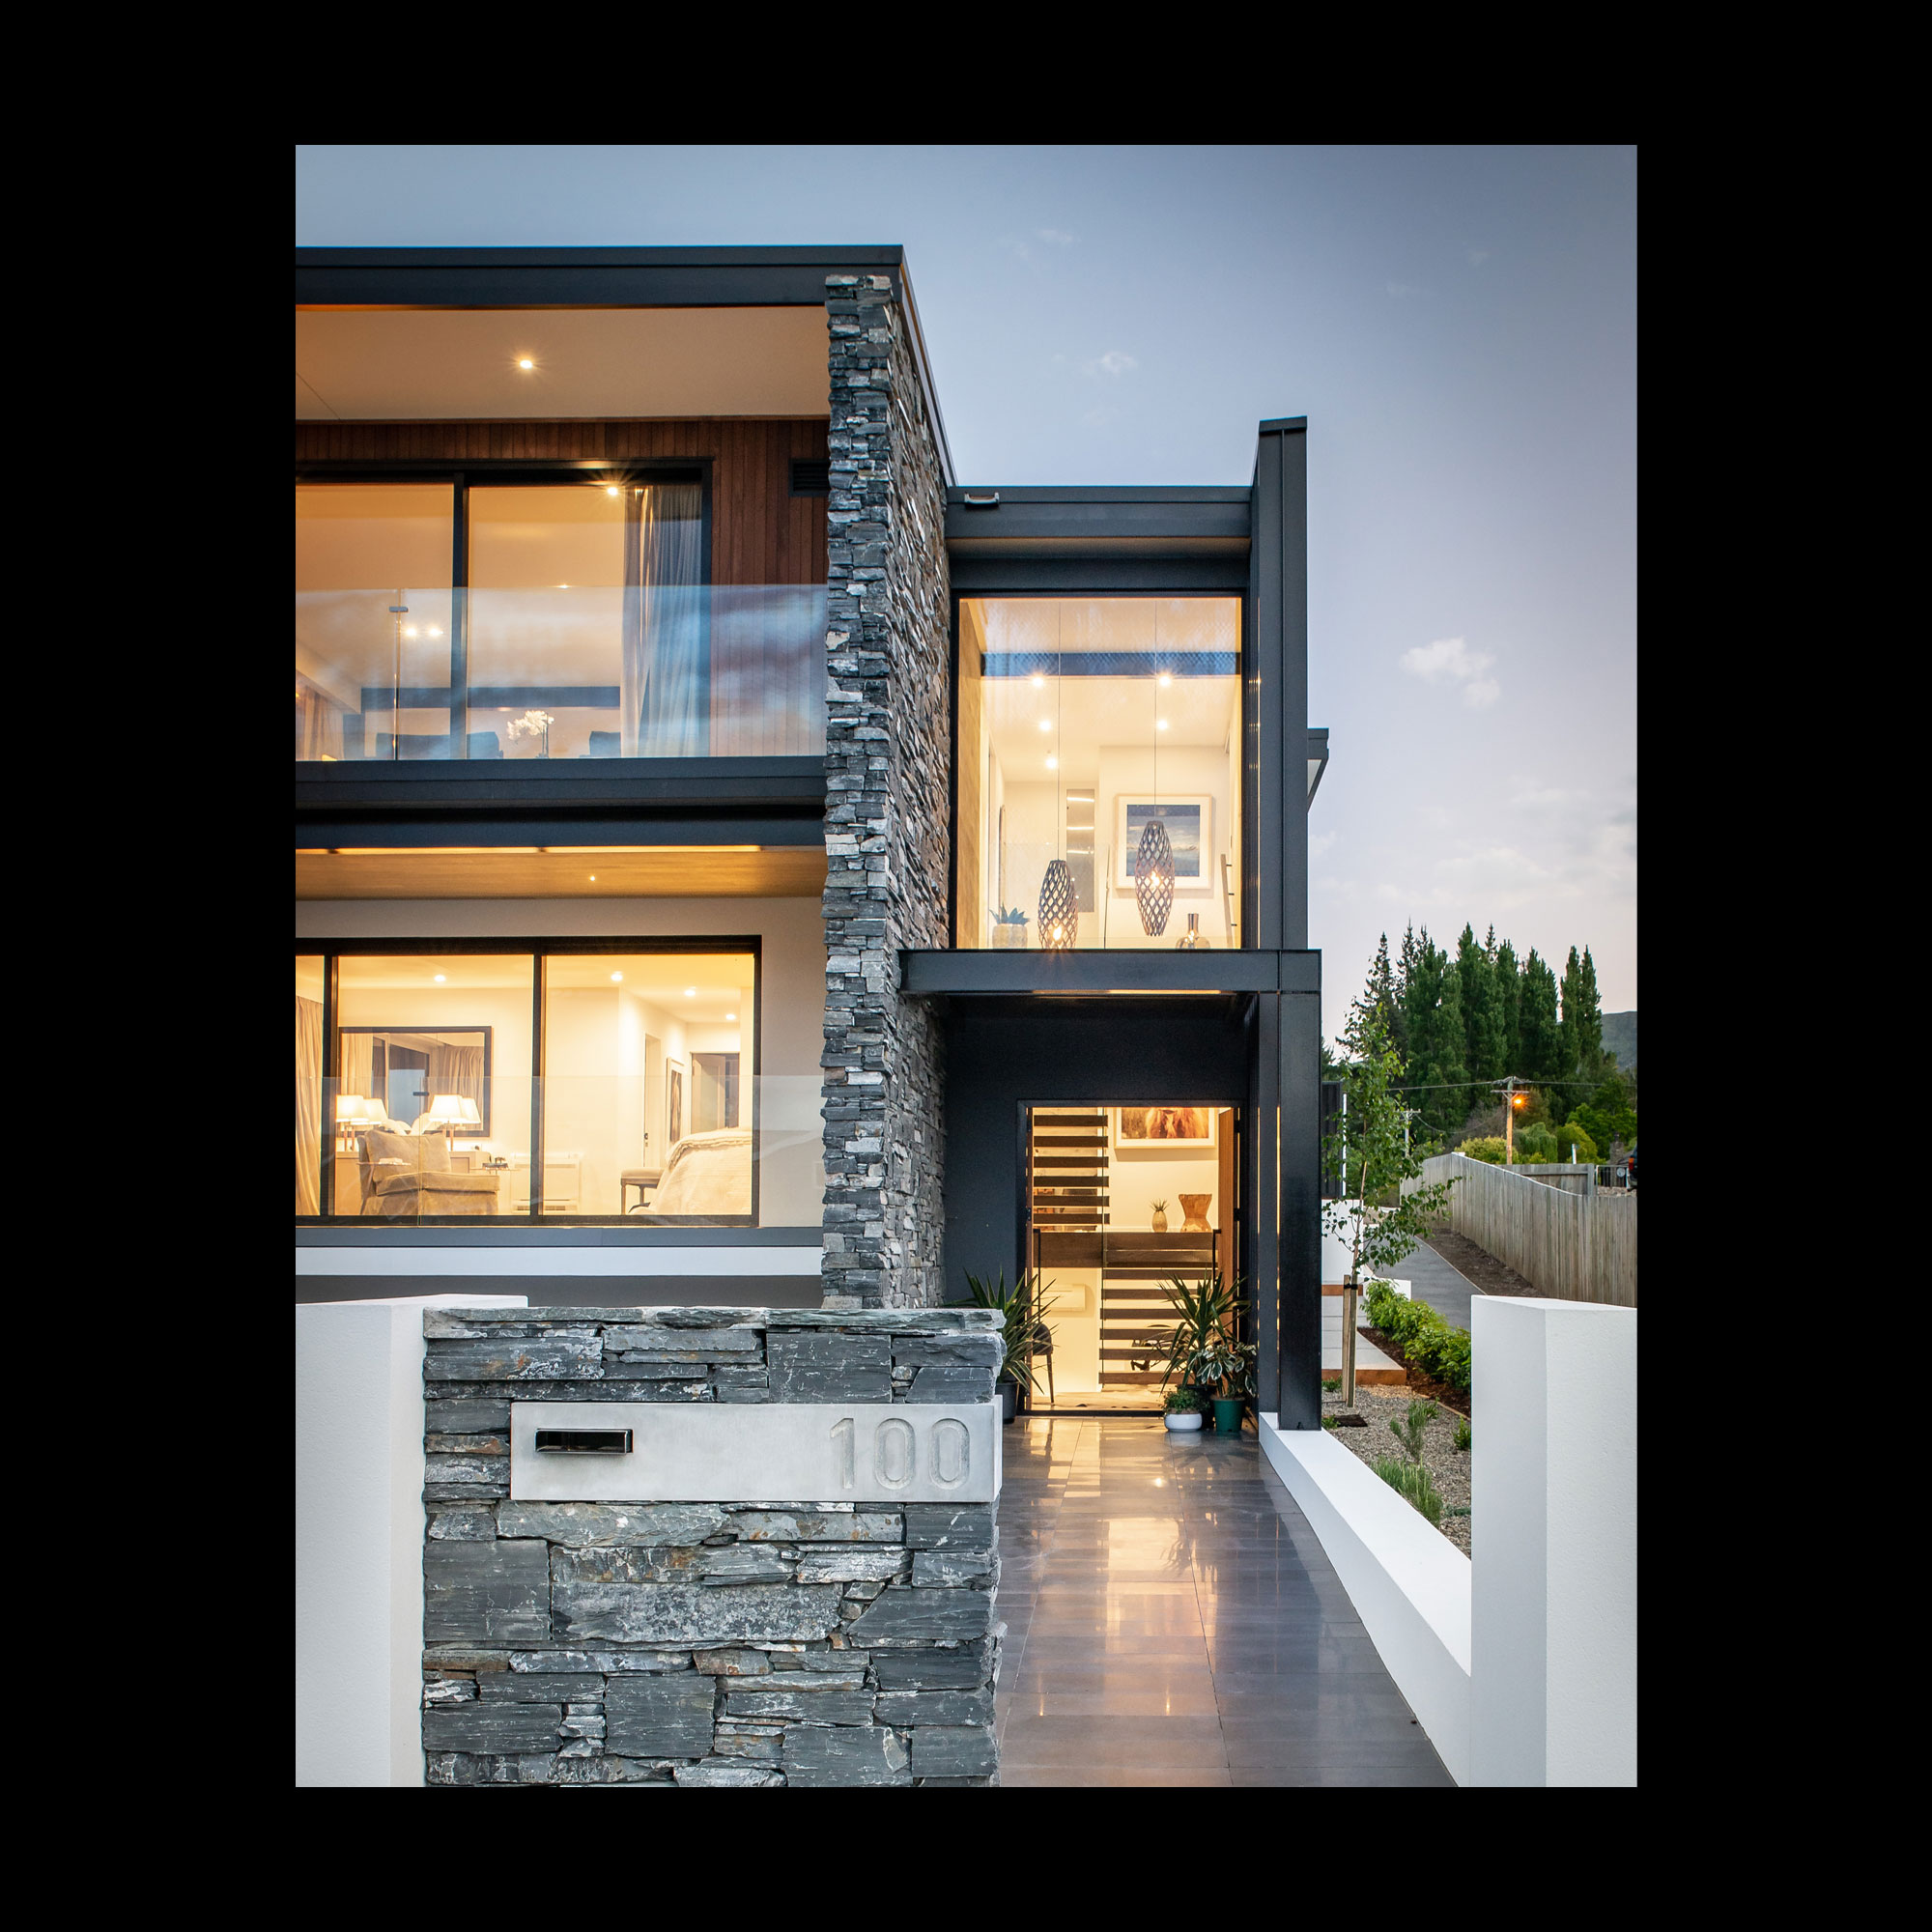 LD-photo-architecture-cb1.jpg